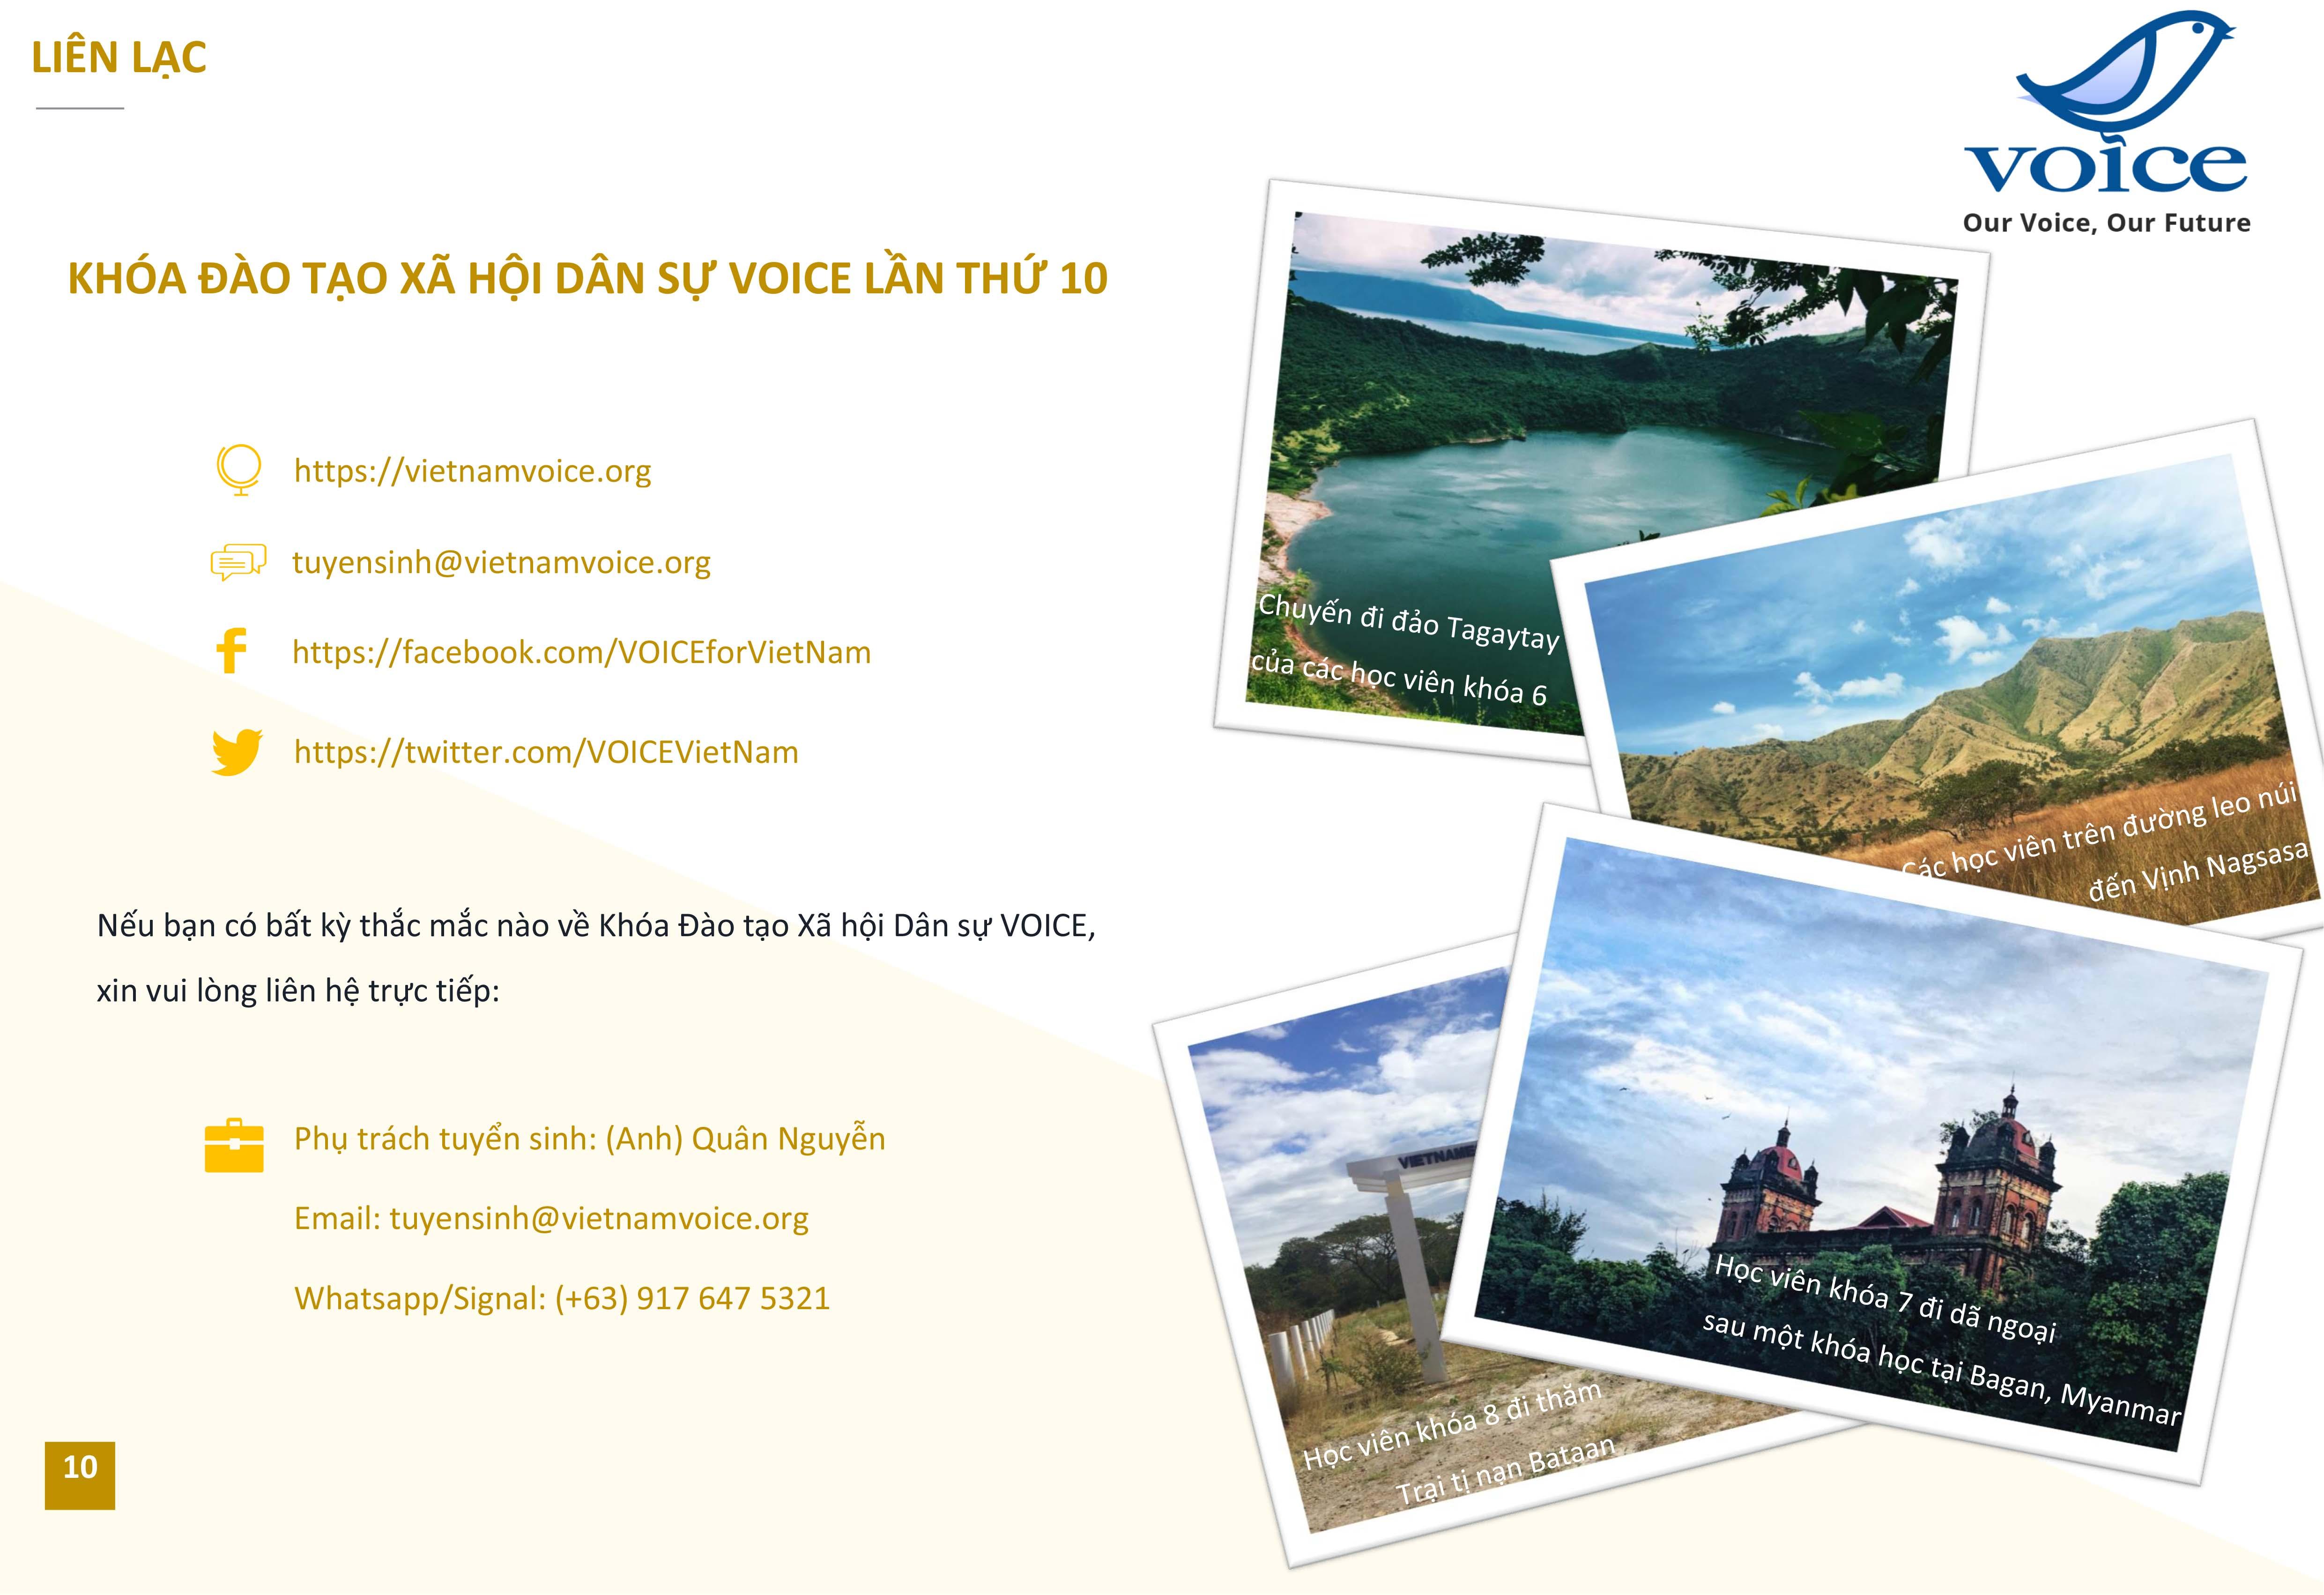 Hoc-Bong-Xa-Hoi-Dan-Su-VOICE-lan-10-p10_VIETNAM-VOICE